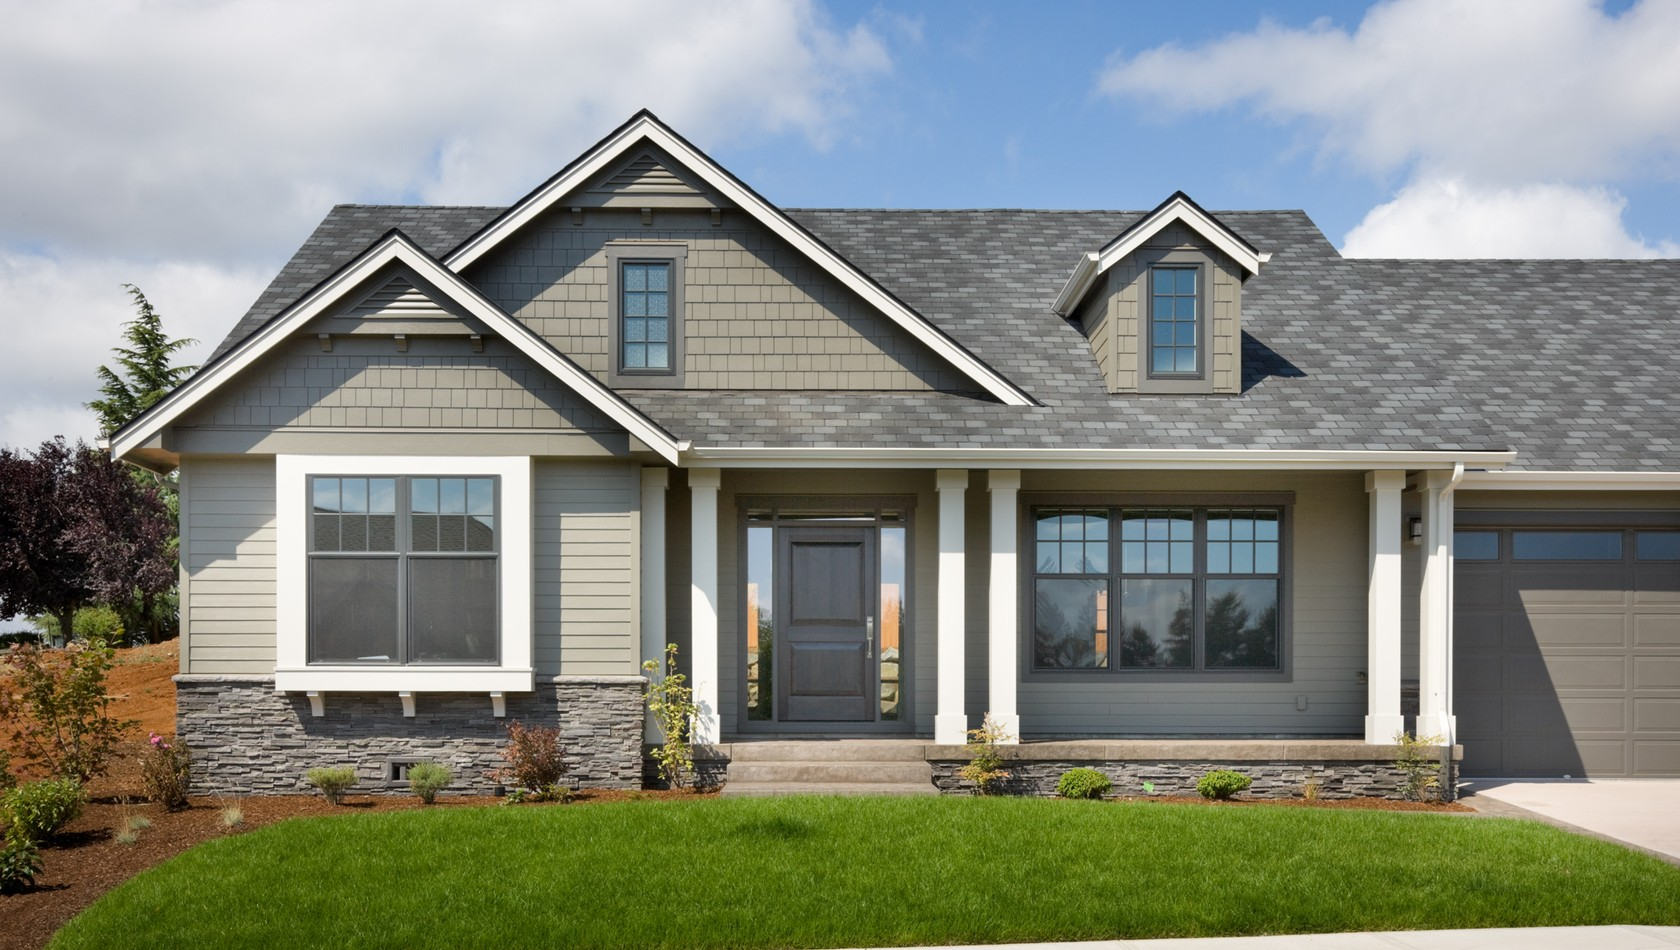 Main image for house plan 22158: The Willard